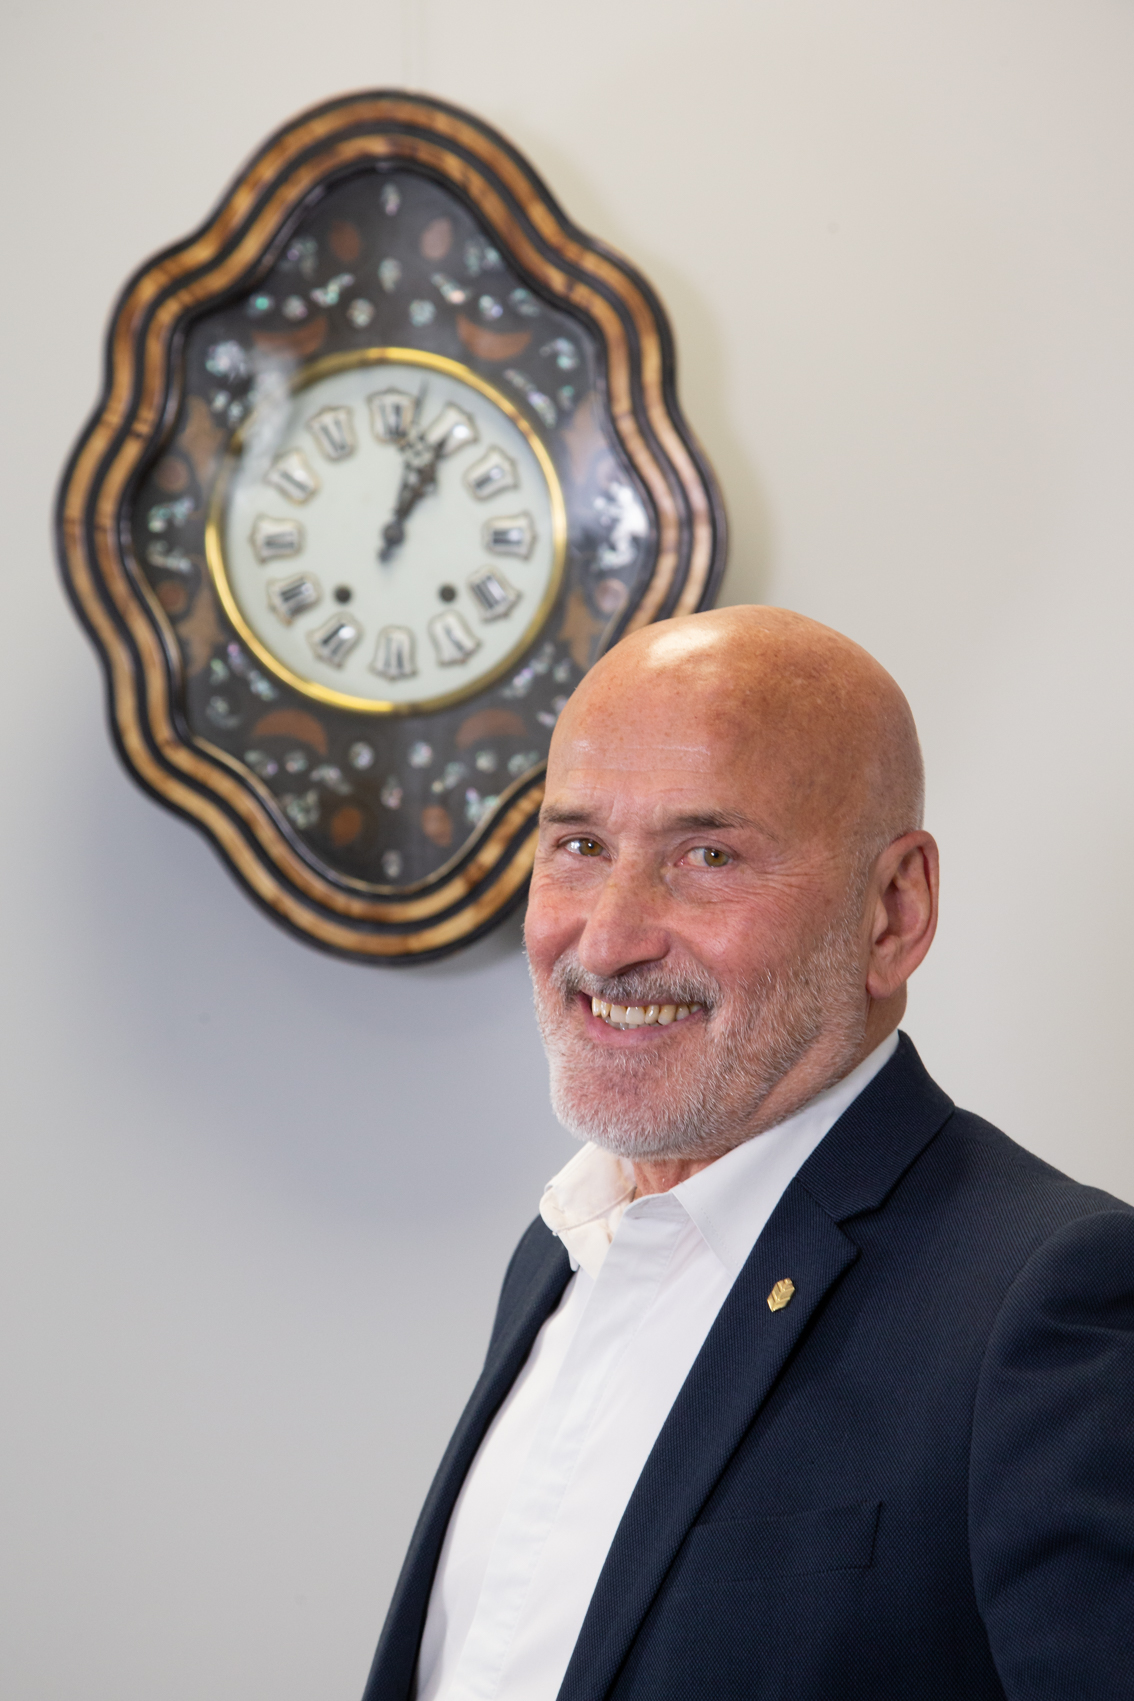 Roberto Morgandi